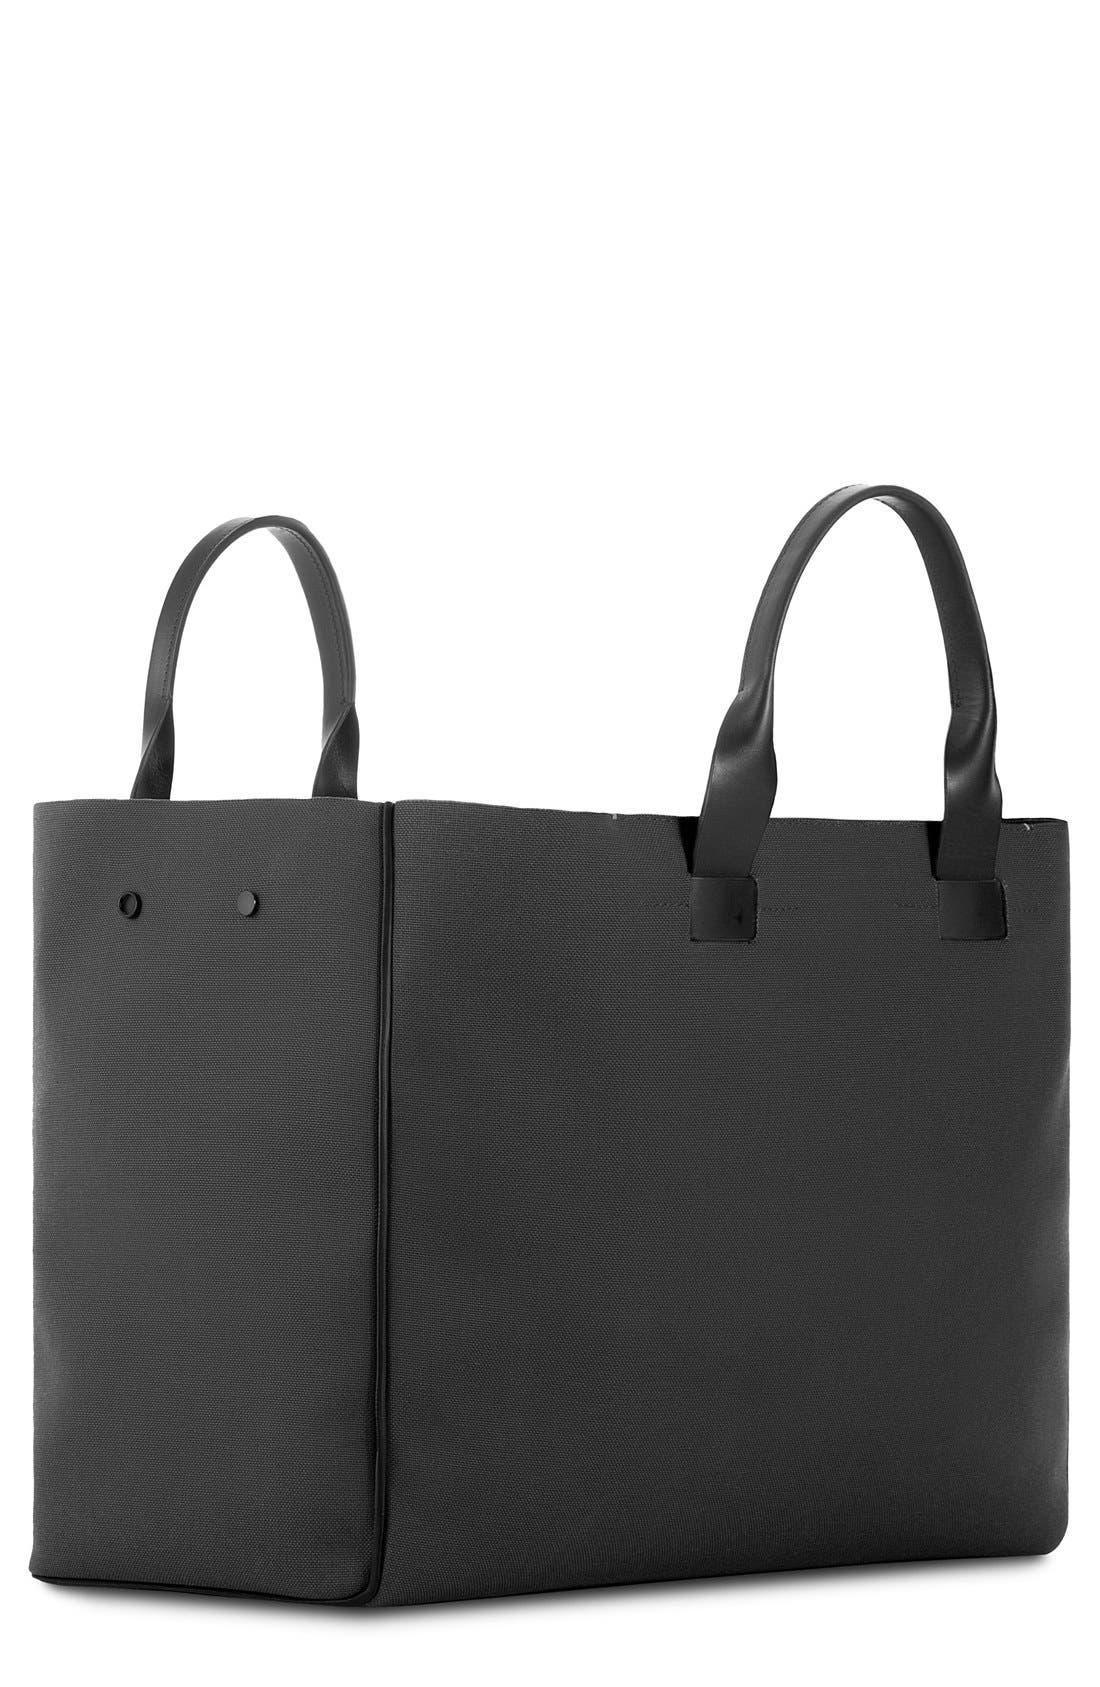 Nylon & Leather Tote Bag,                             Main thumbnail 1, color,                             001